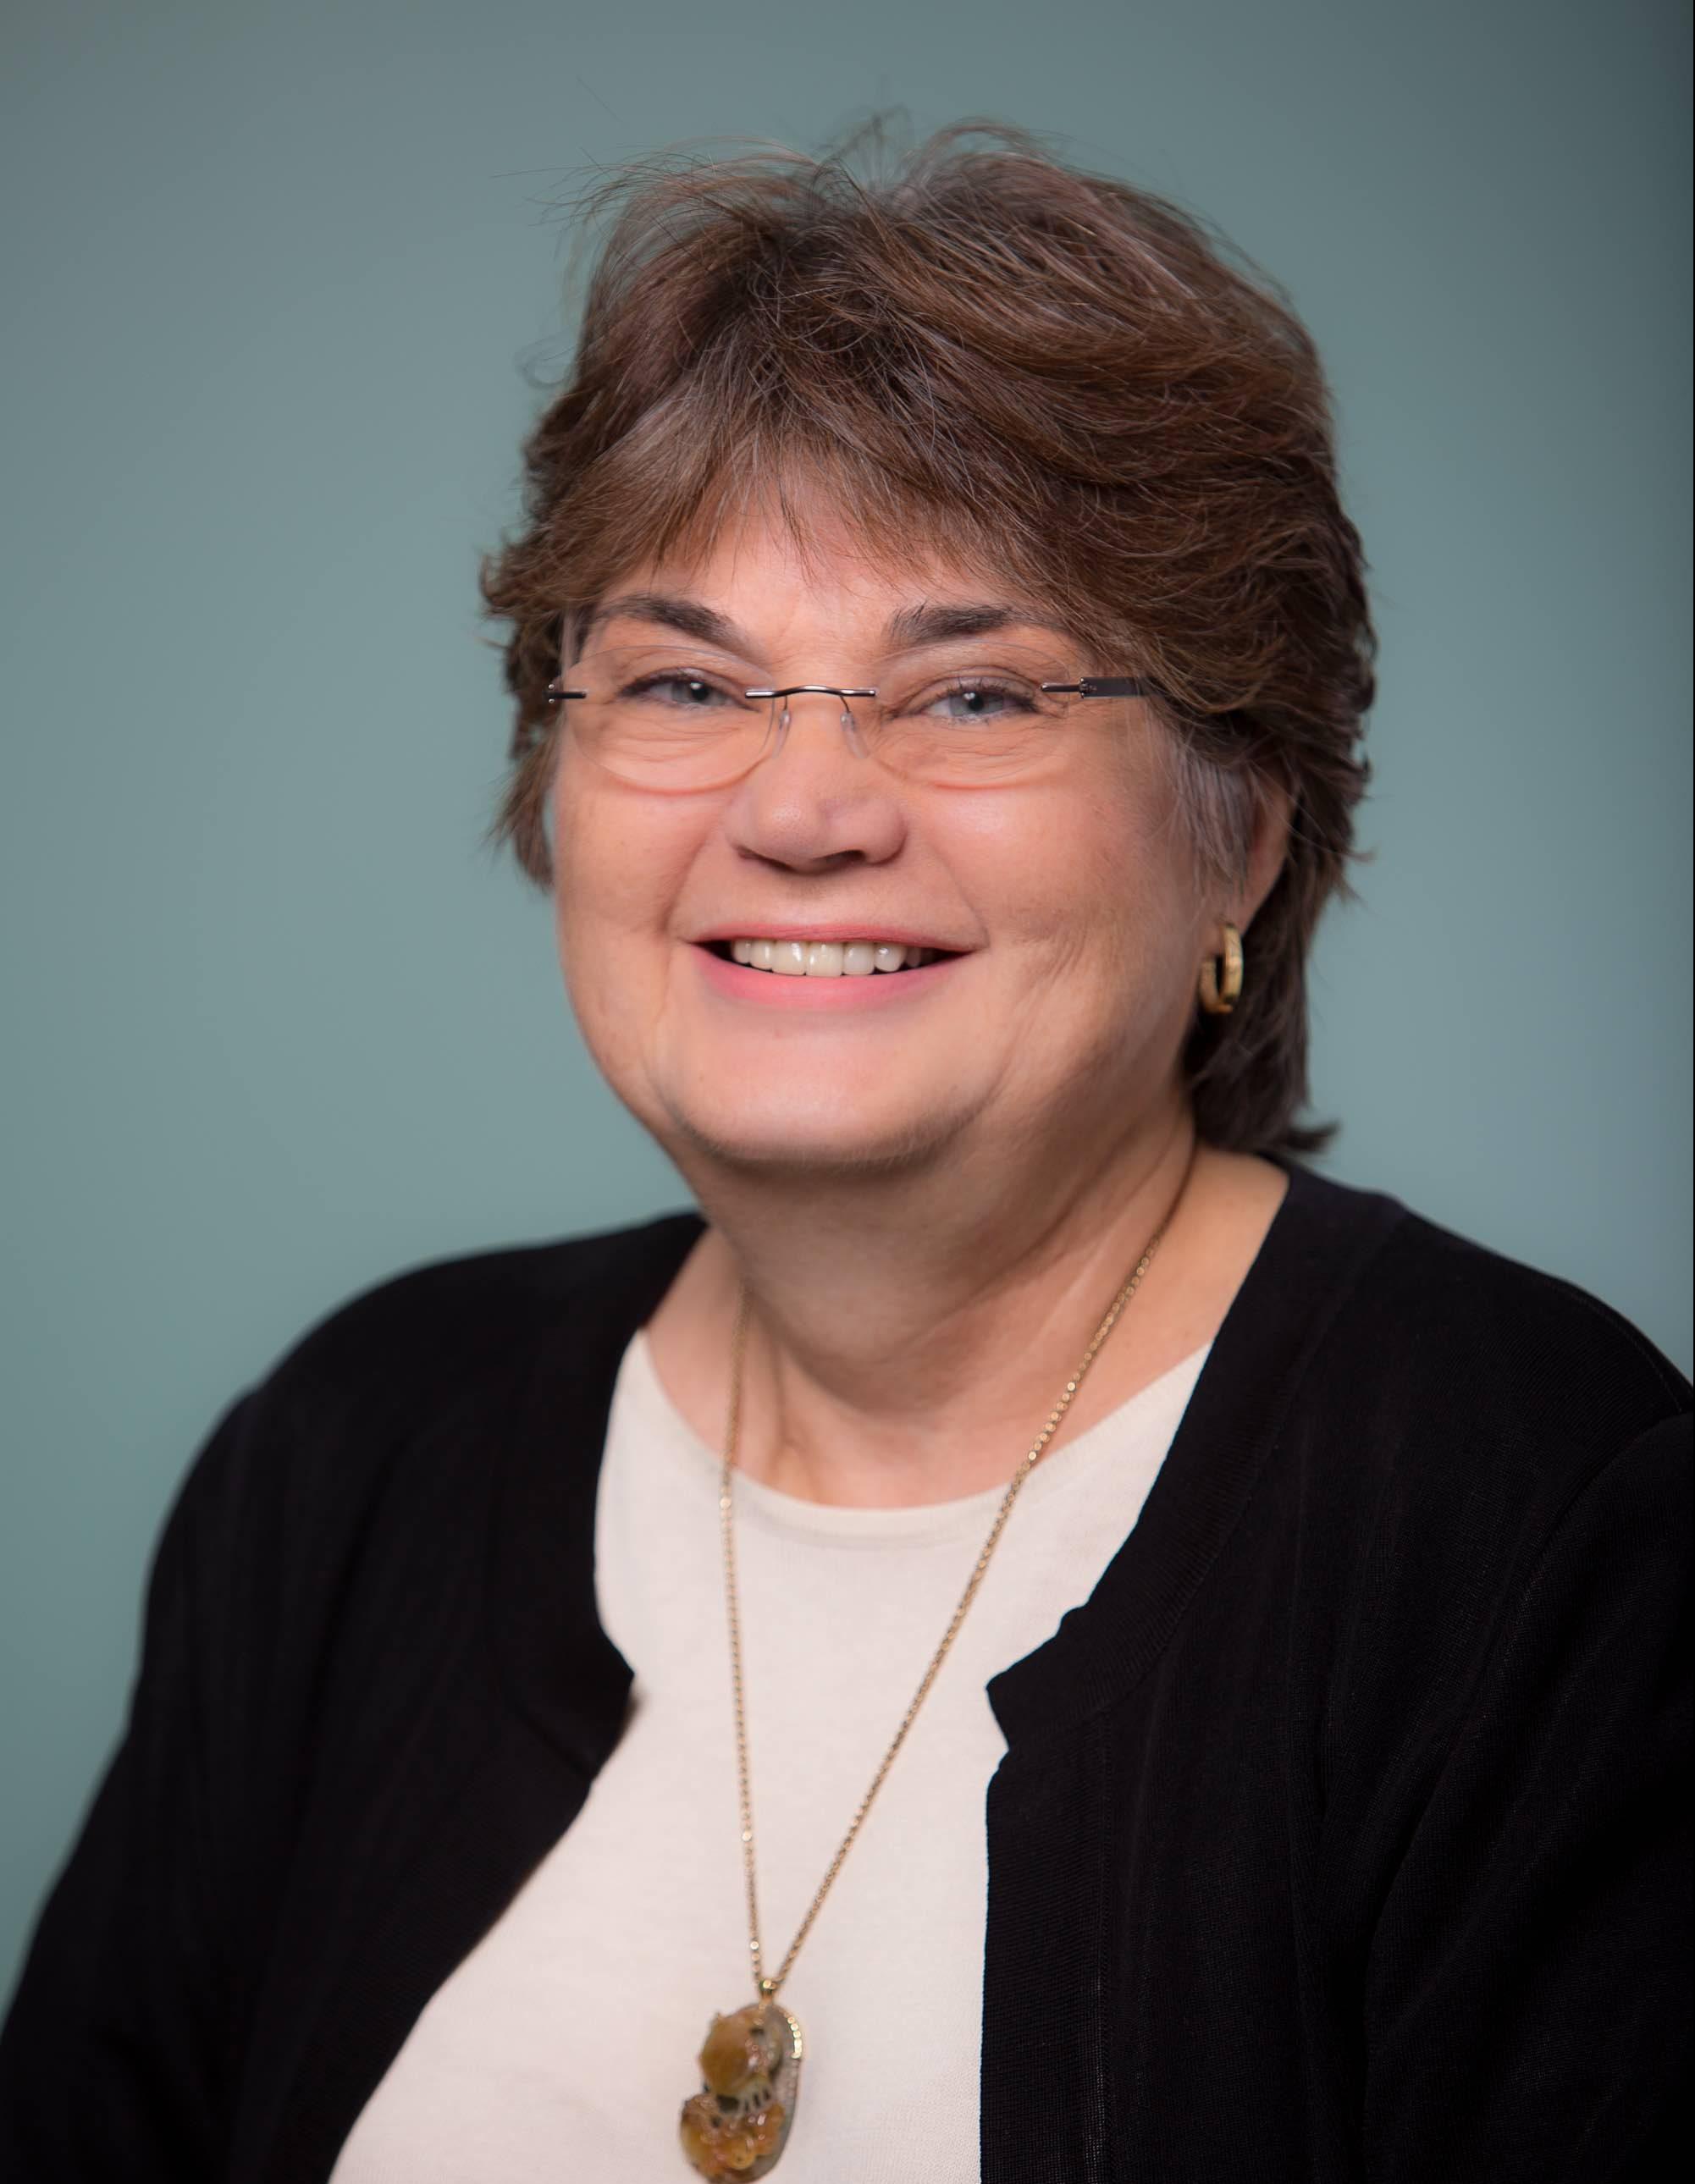 Portrait of Lynn McCrory